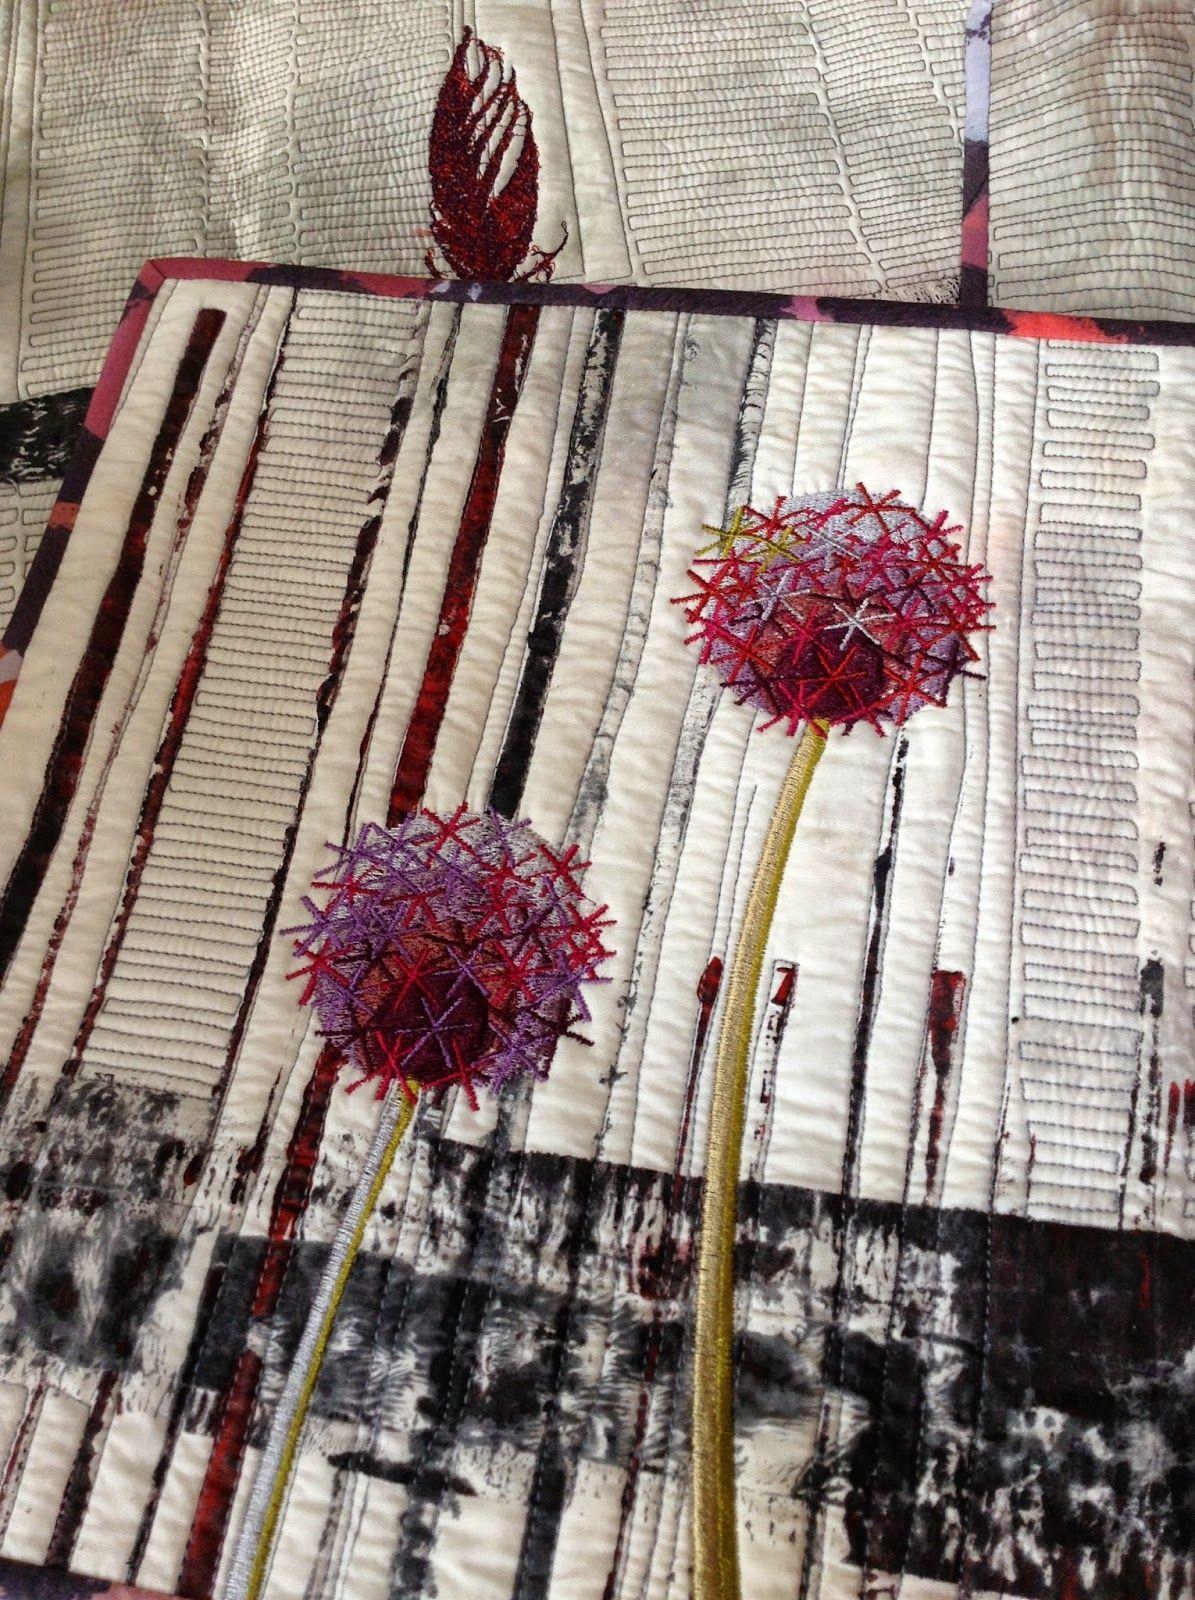 Linda Kemshall Teinture, impression des tissus, couture, broderie à la machine